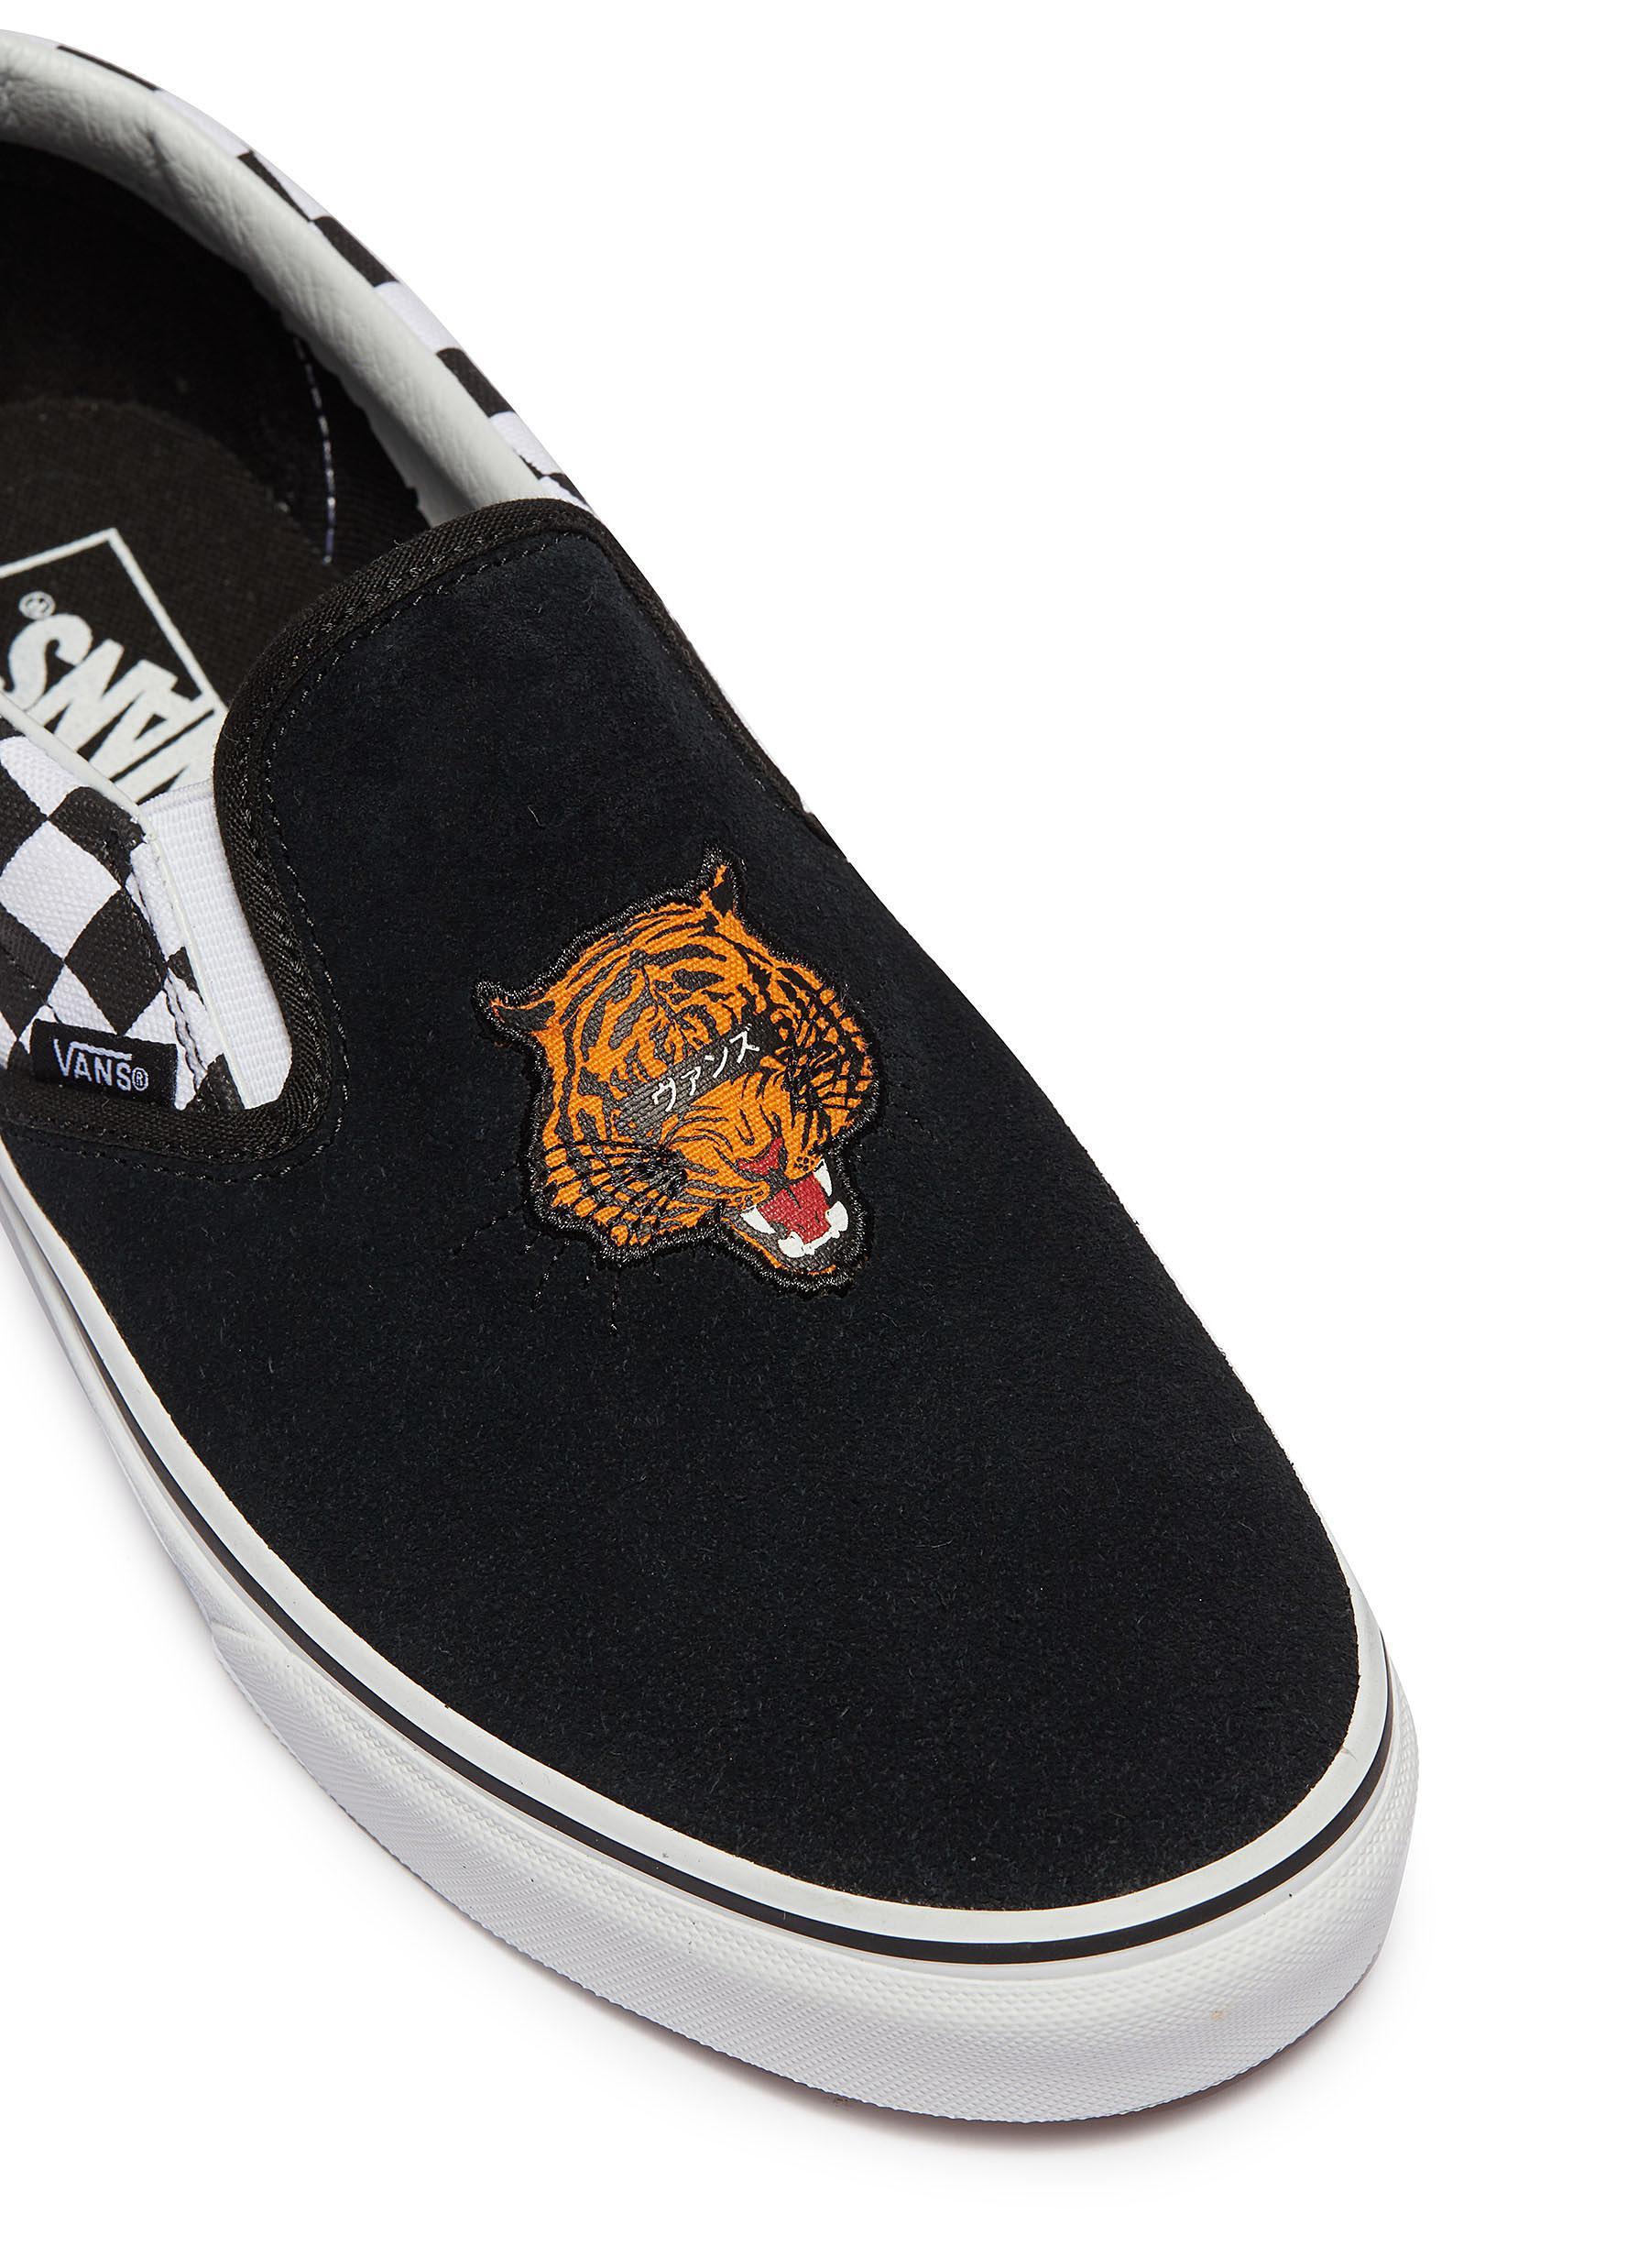 Vans 'classic Slip-on' Tiger